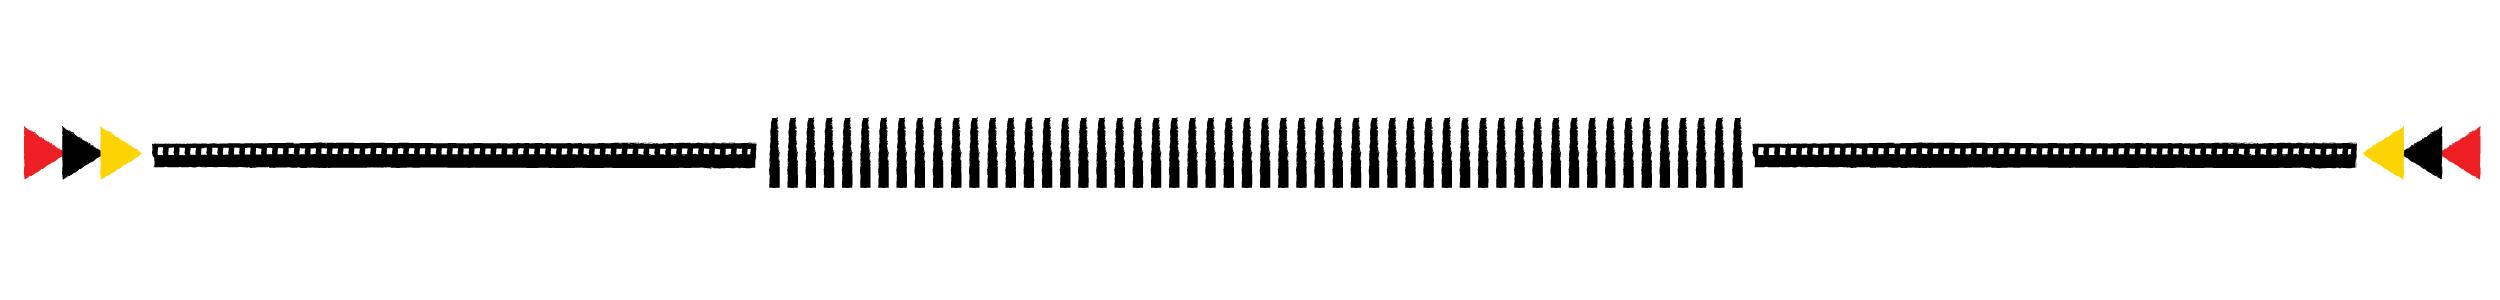 border1.jpg